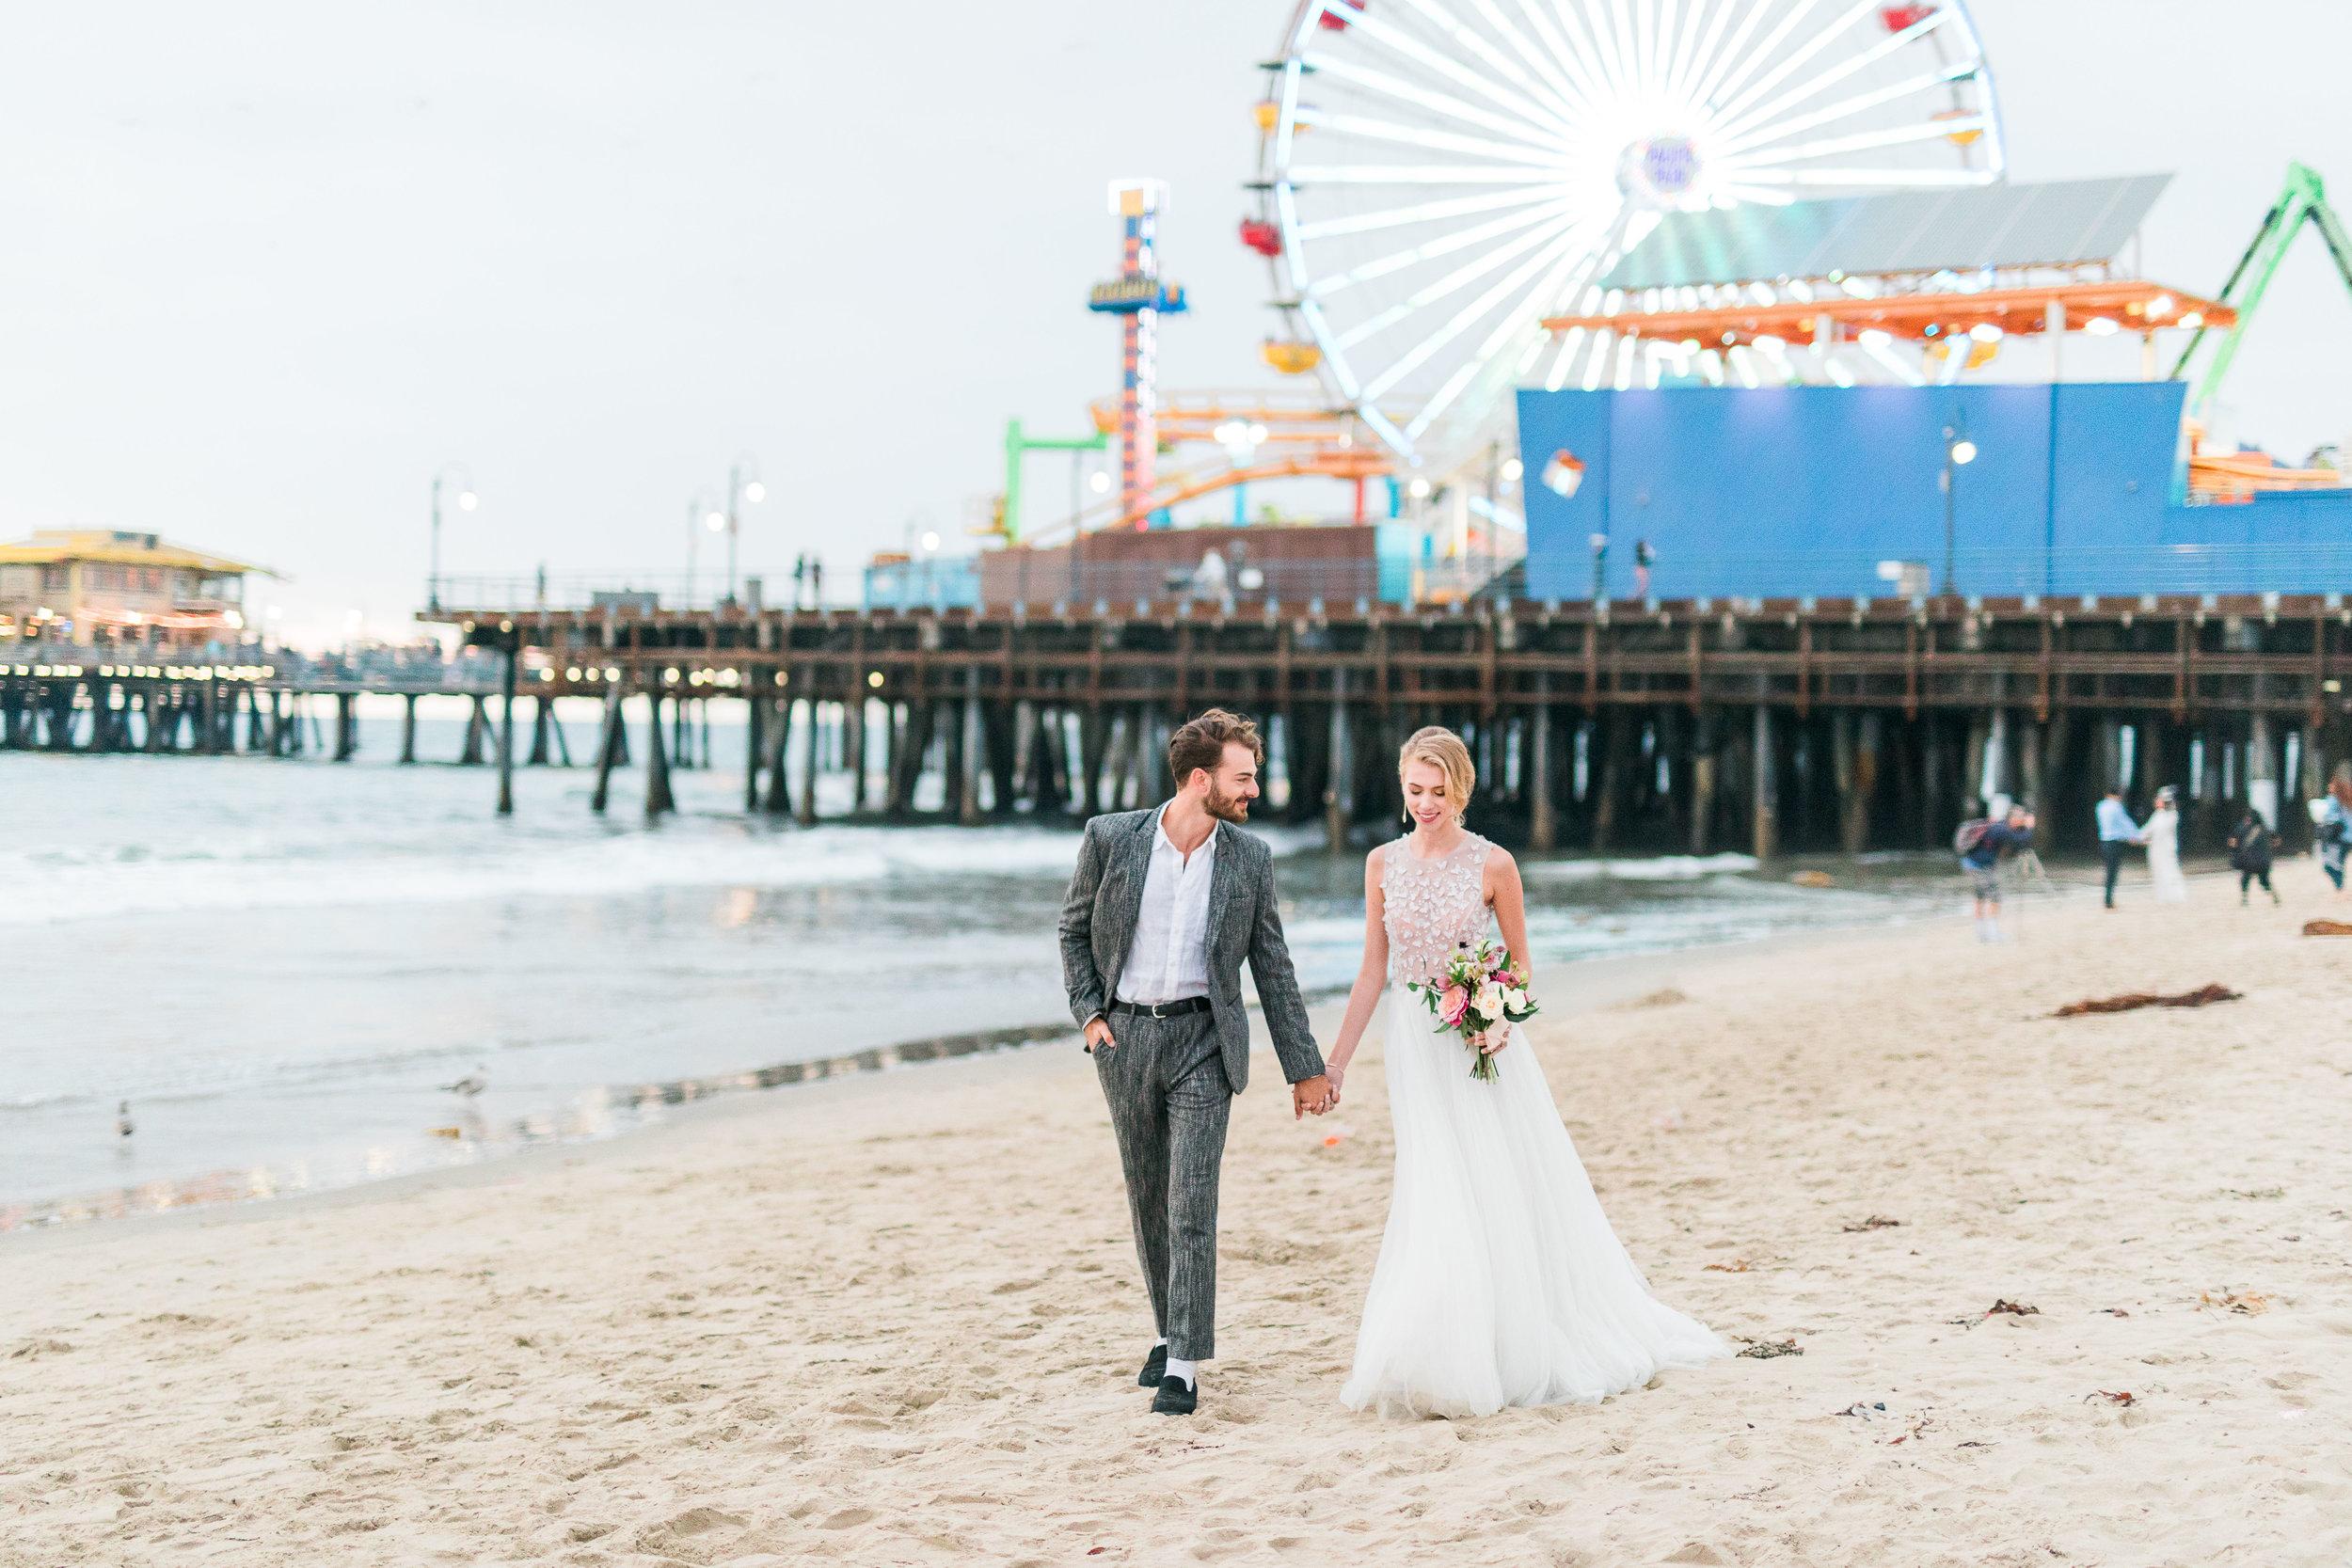 LA-Wedding-Shoot-by-JBJ-Pictures-163.jpg